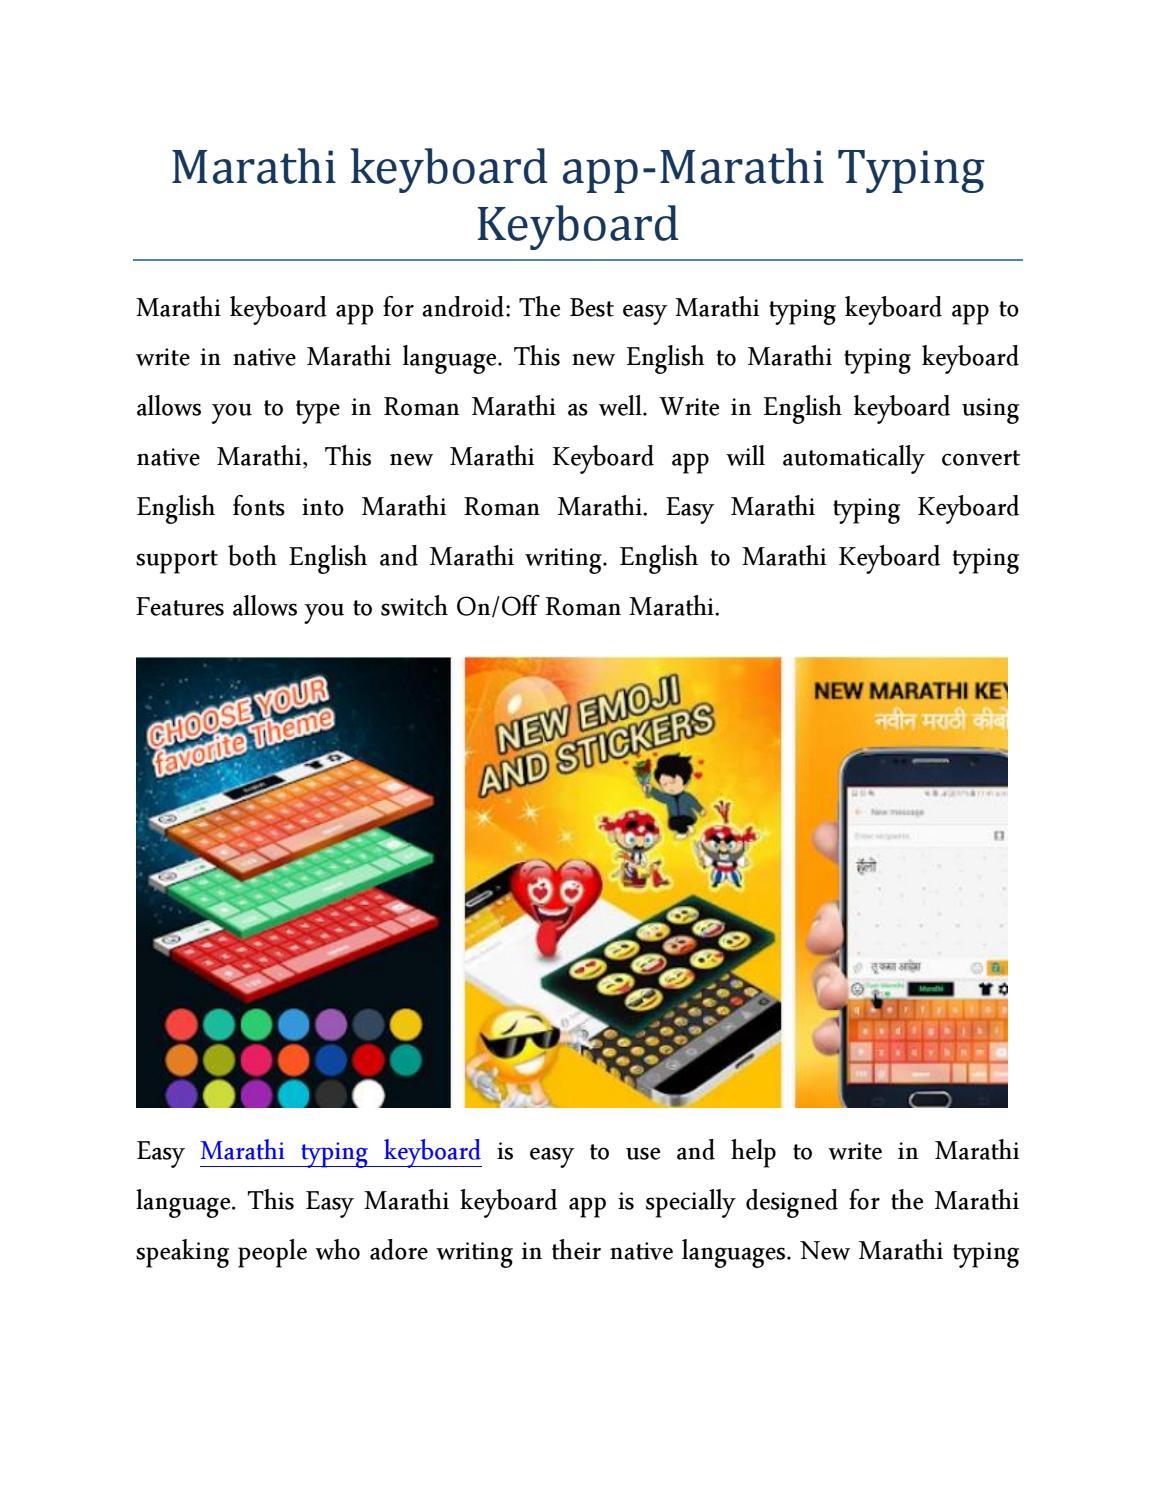 Marathi keyboard app marathi typing keyboard by Saha Oma - issuu